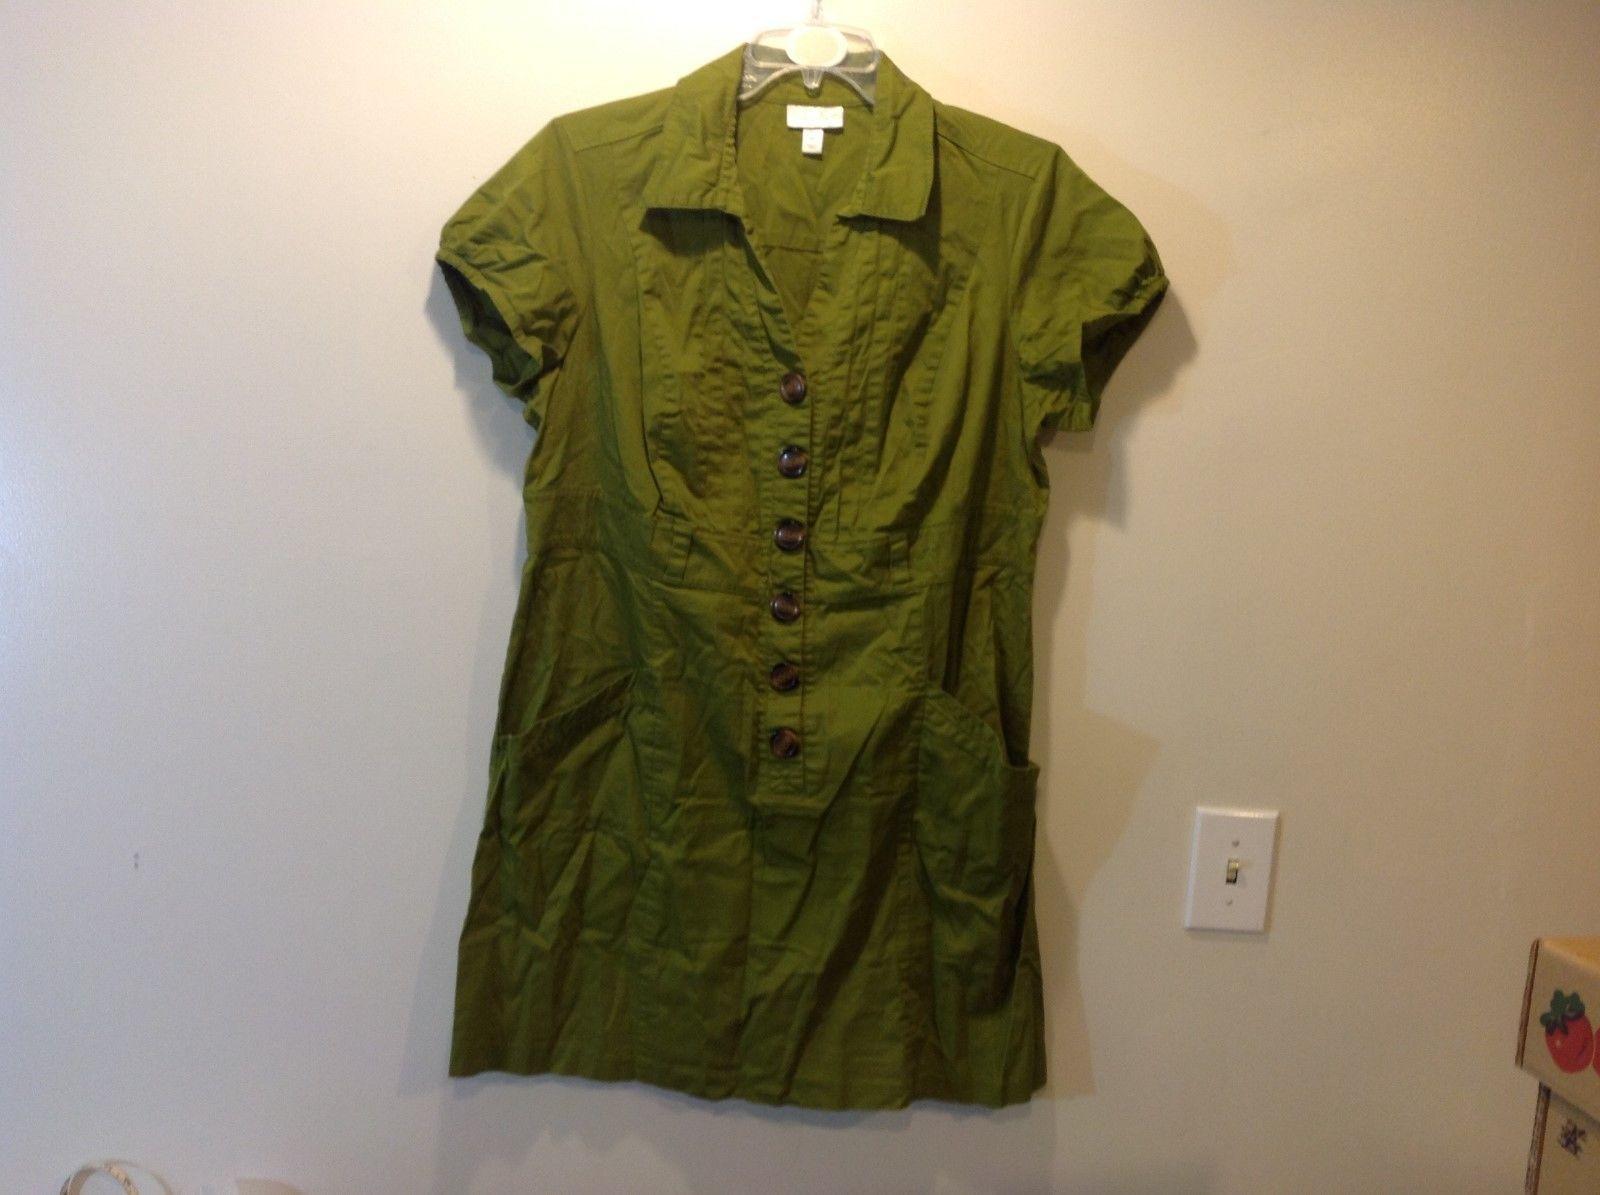 Ladies Green V-Neck Short Sleeve Casual Dress by DressBarn Sz 18W